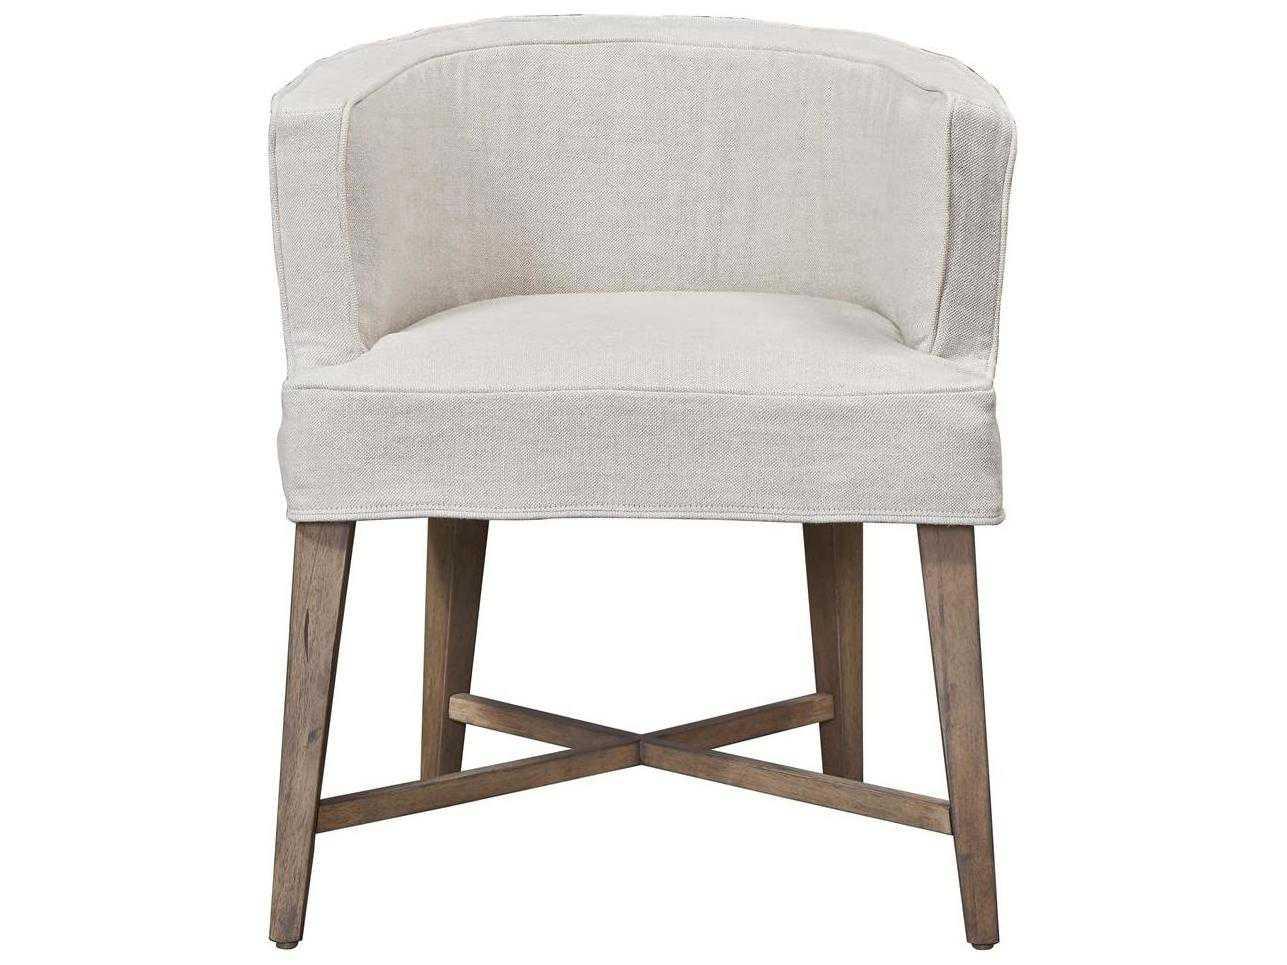 Universal furniture authenticity reunion dining set uf572656set - Universal furniture dining room set ...